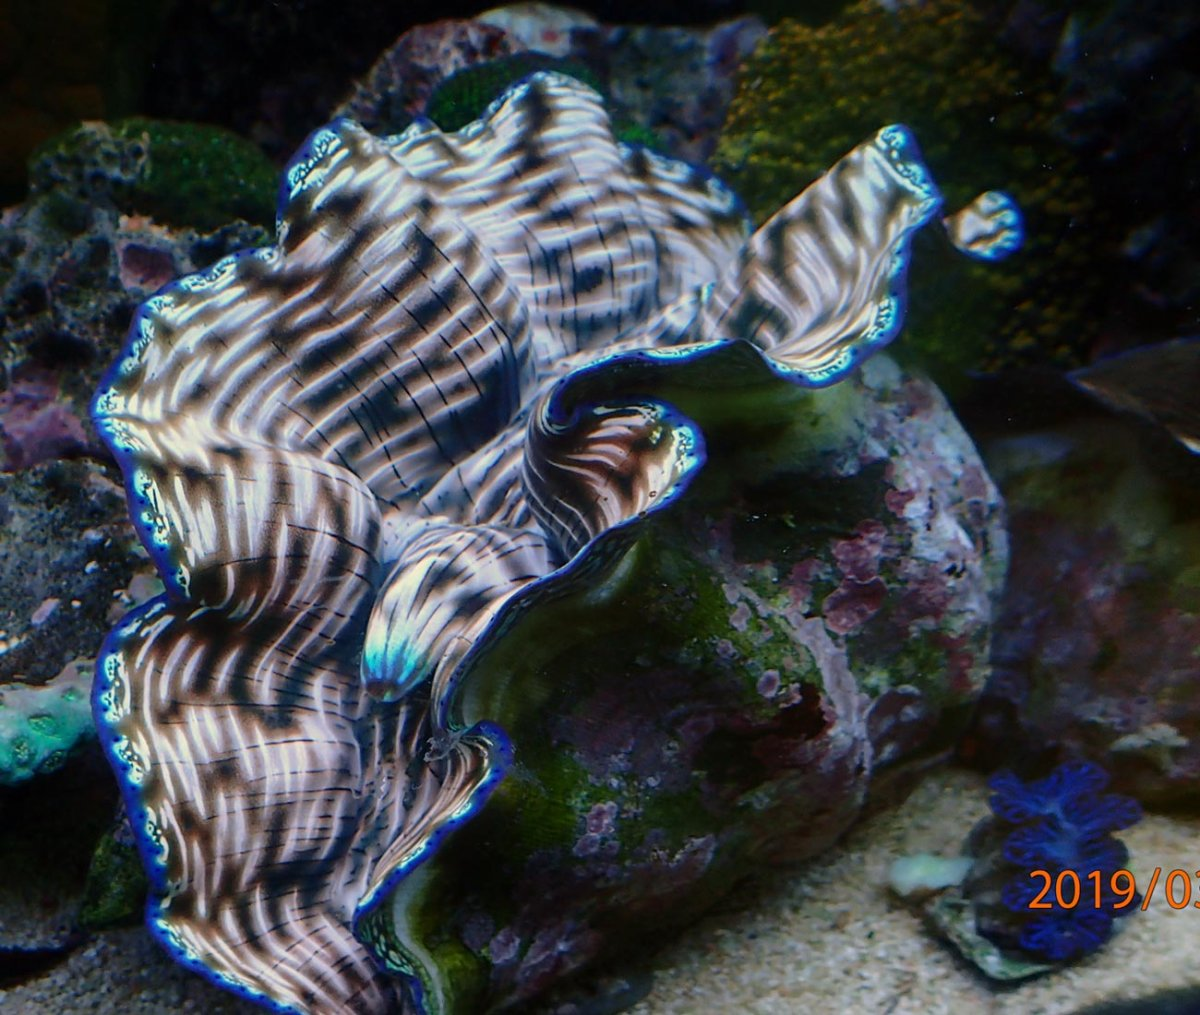 190306-180-mm-clam.jpg